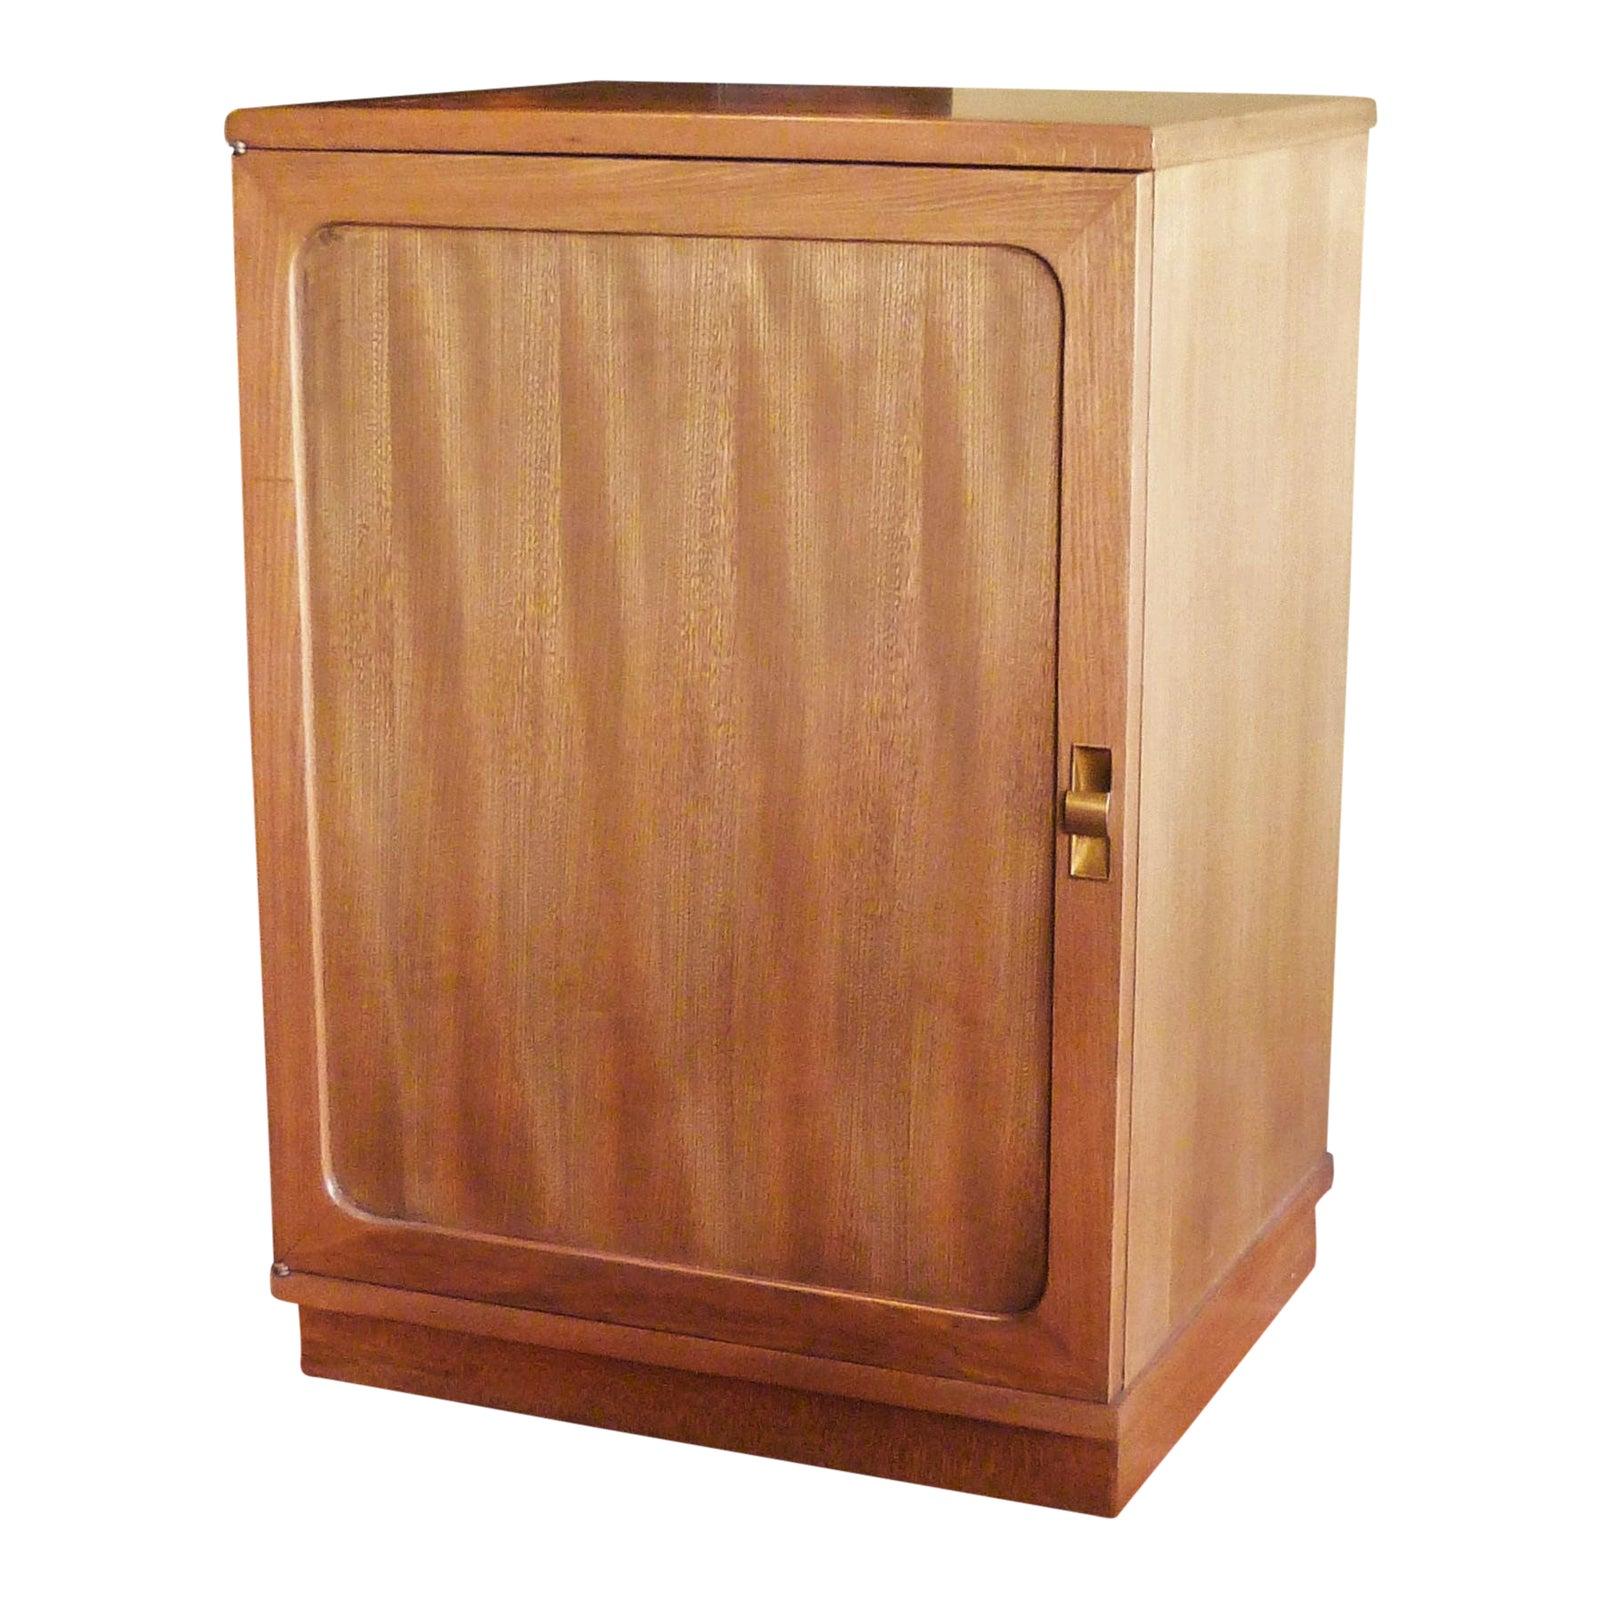 1940s mid century modern edward wormley silver elm dry bar cabinet chairish